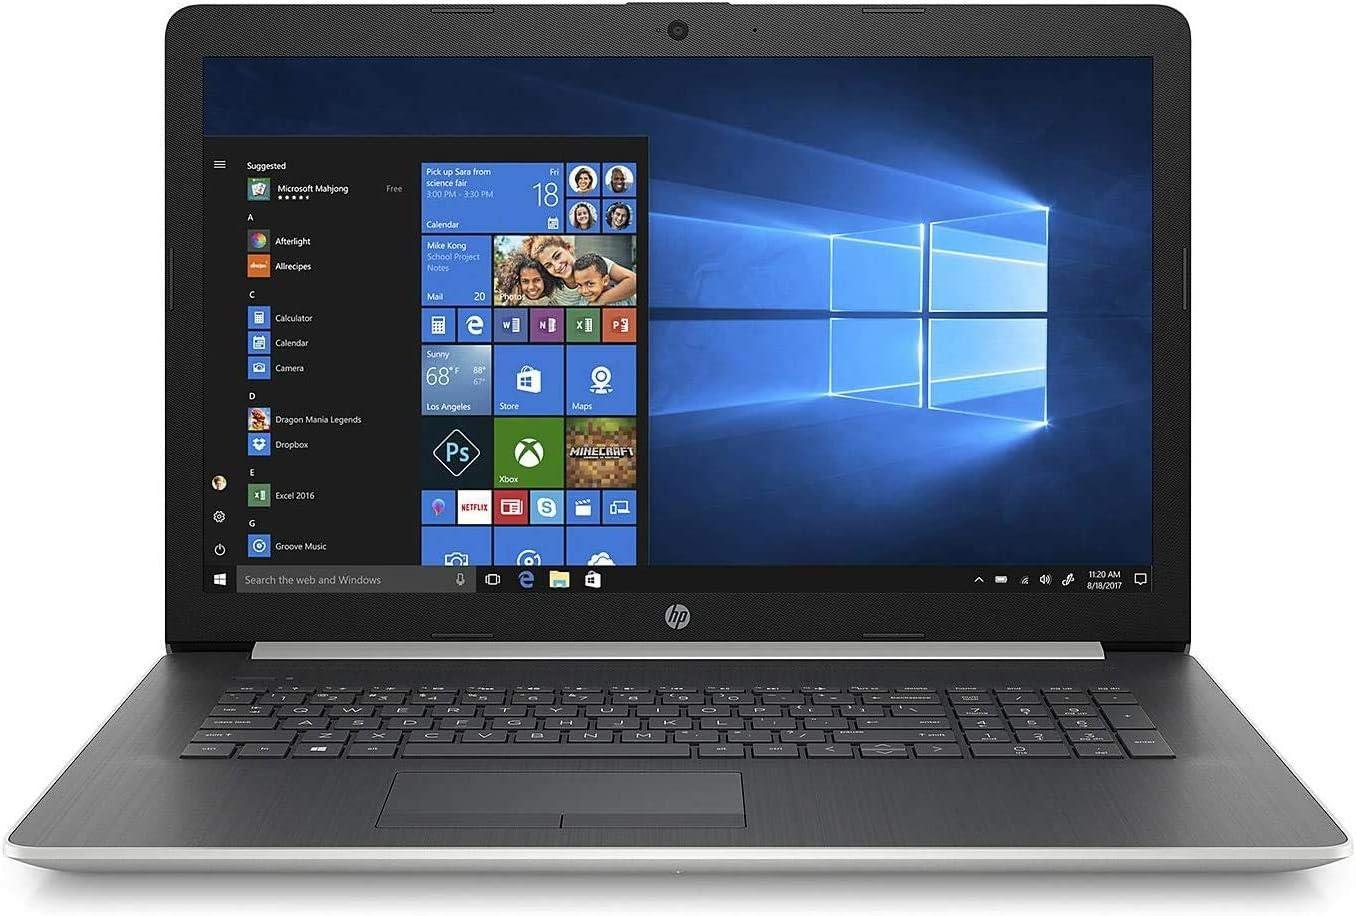 2020 Newest HP 17 High-Performance PC laptop : 17.3 HD+ Anti-Glare Display, AMD Ryzen 3-3200 Processor, 8GB Ram, 512GB SSD, AMD Radeon Vega 3, Wifi, Bluetooth, DVDRW, HDMI, TureVision HD Webcam, Win10